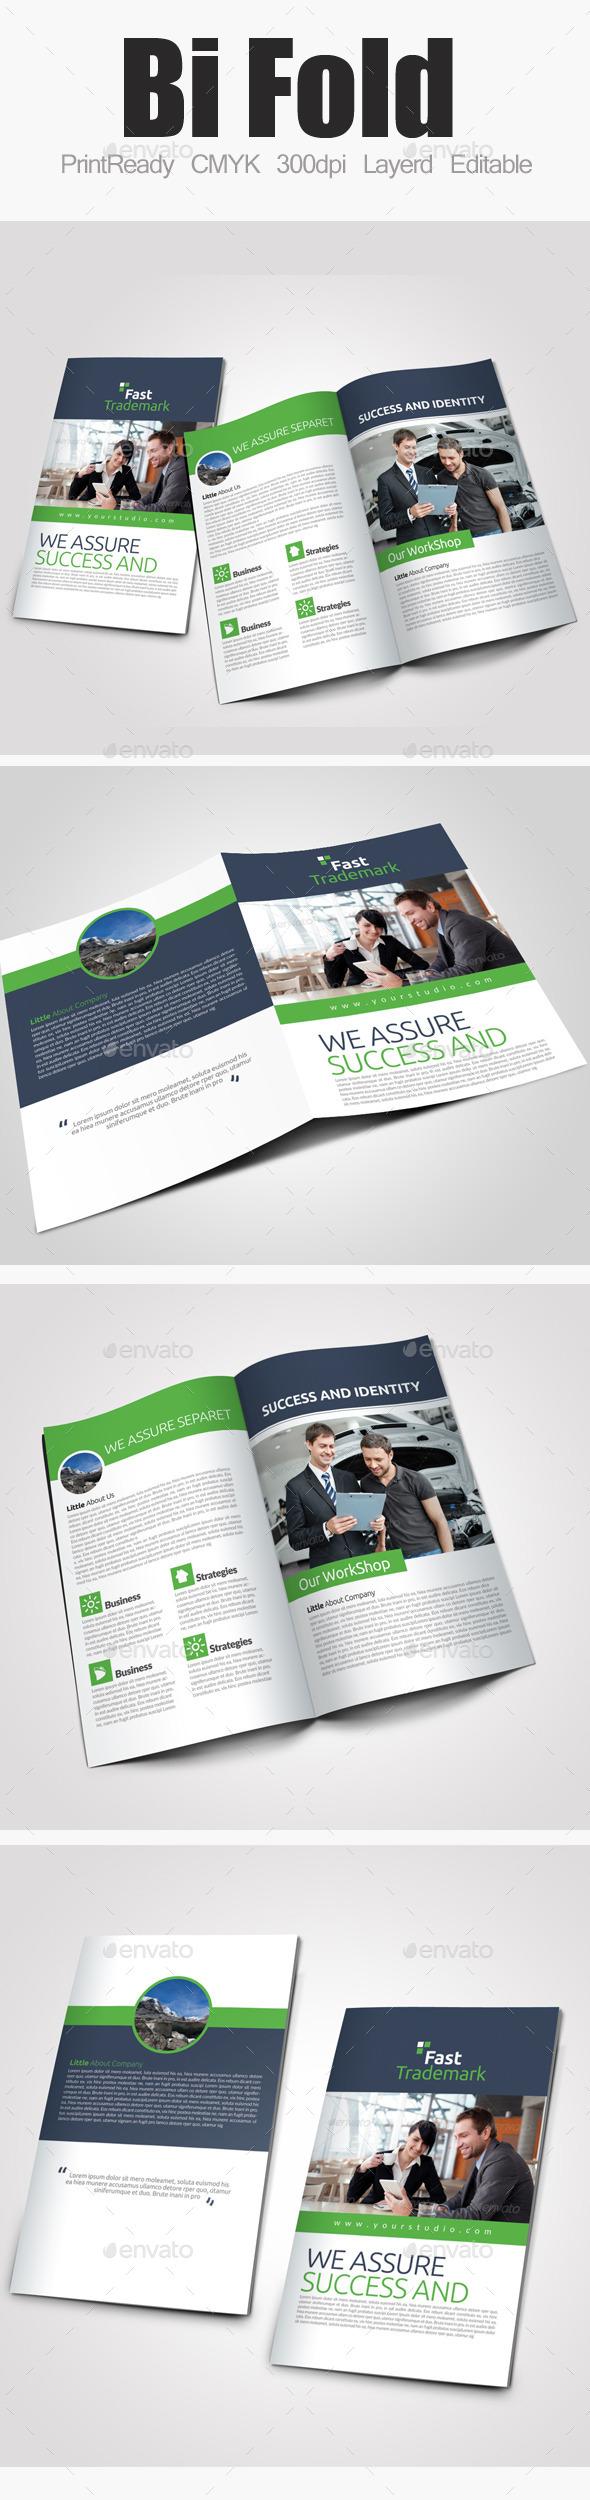 Bi Fold Business Brochure - Corporate Brochures